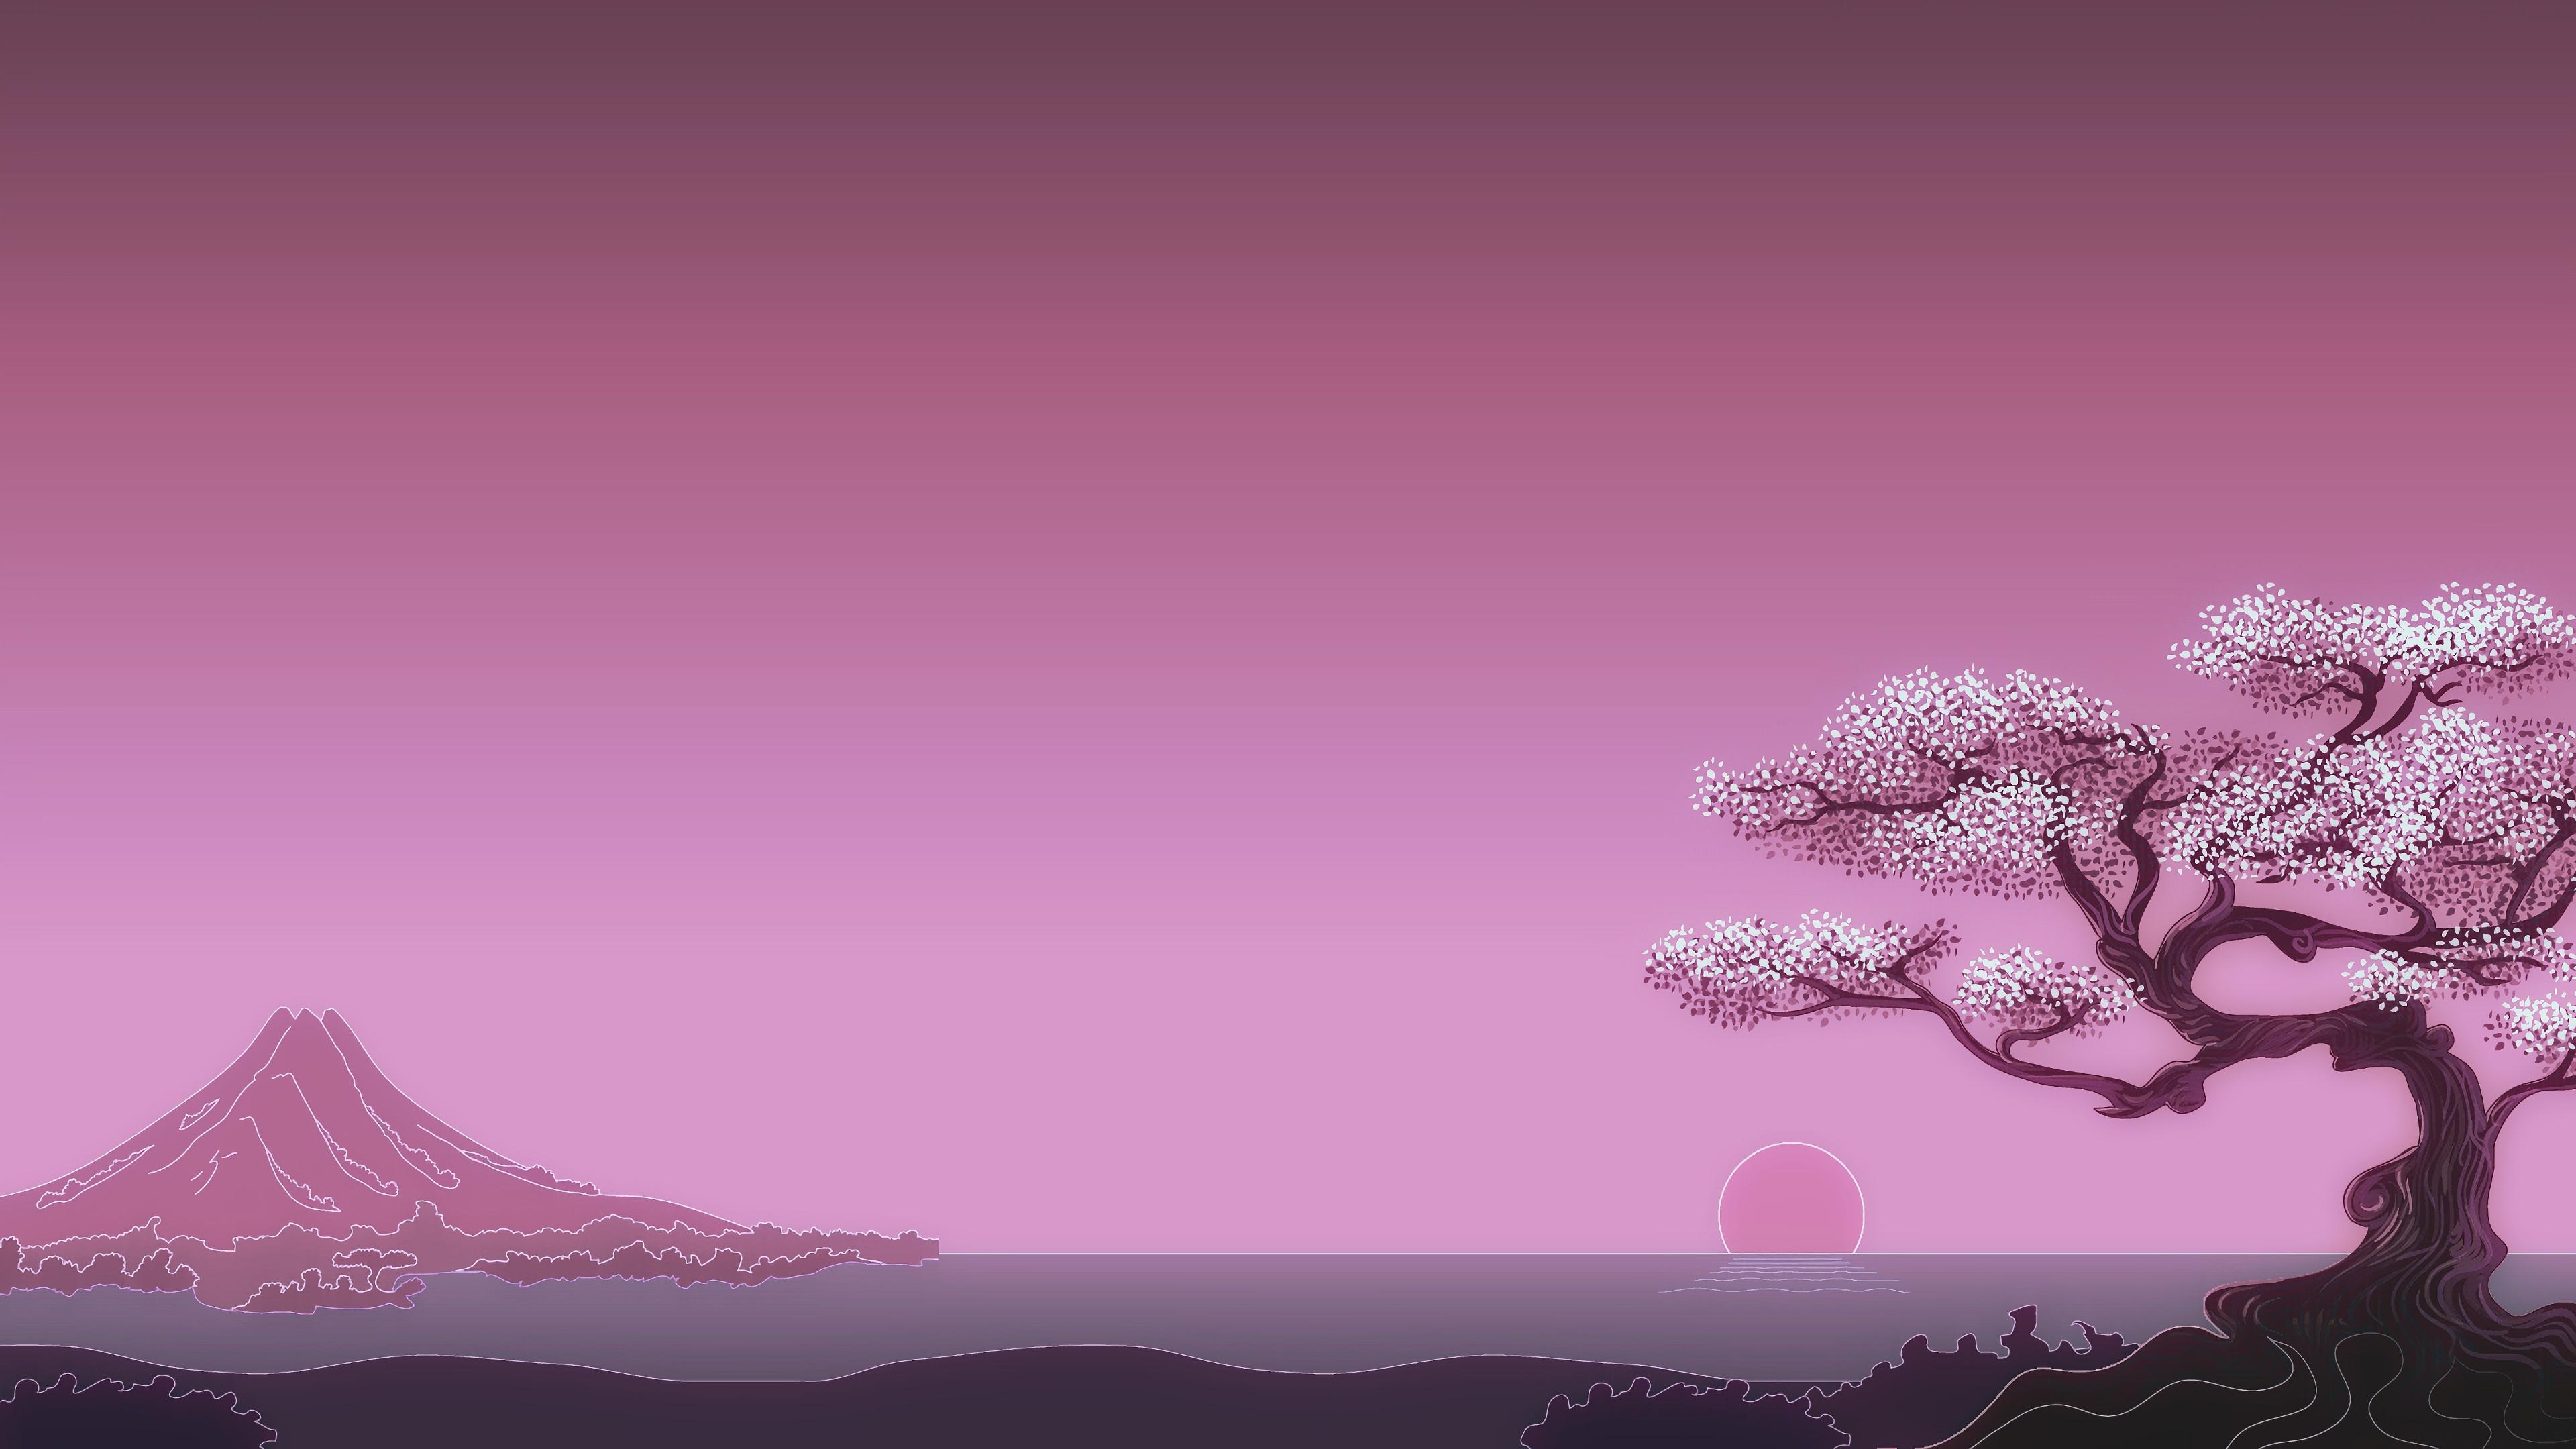 Japan Minimalist Wallpapers - Top Free ...